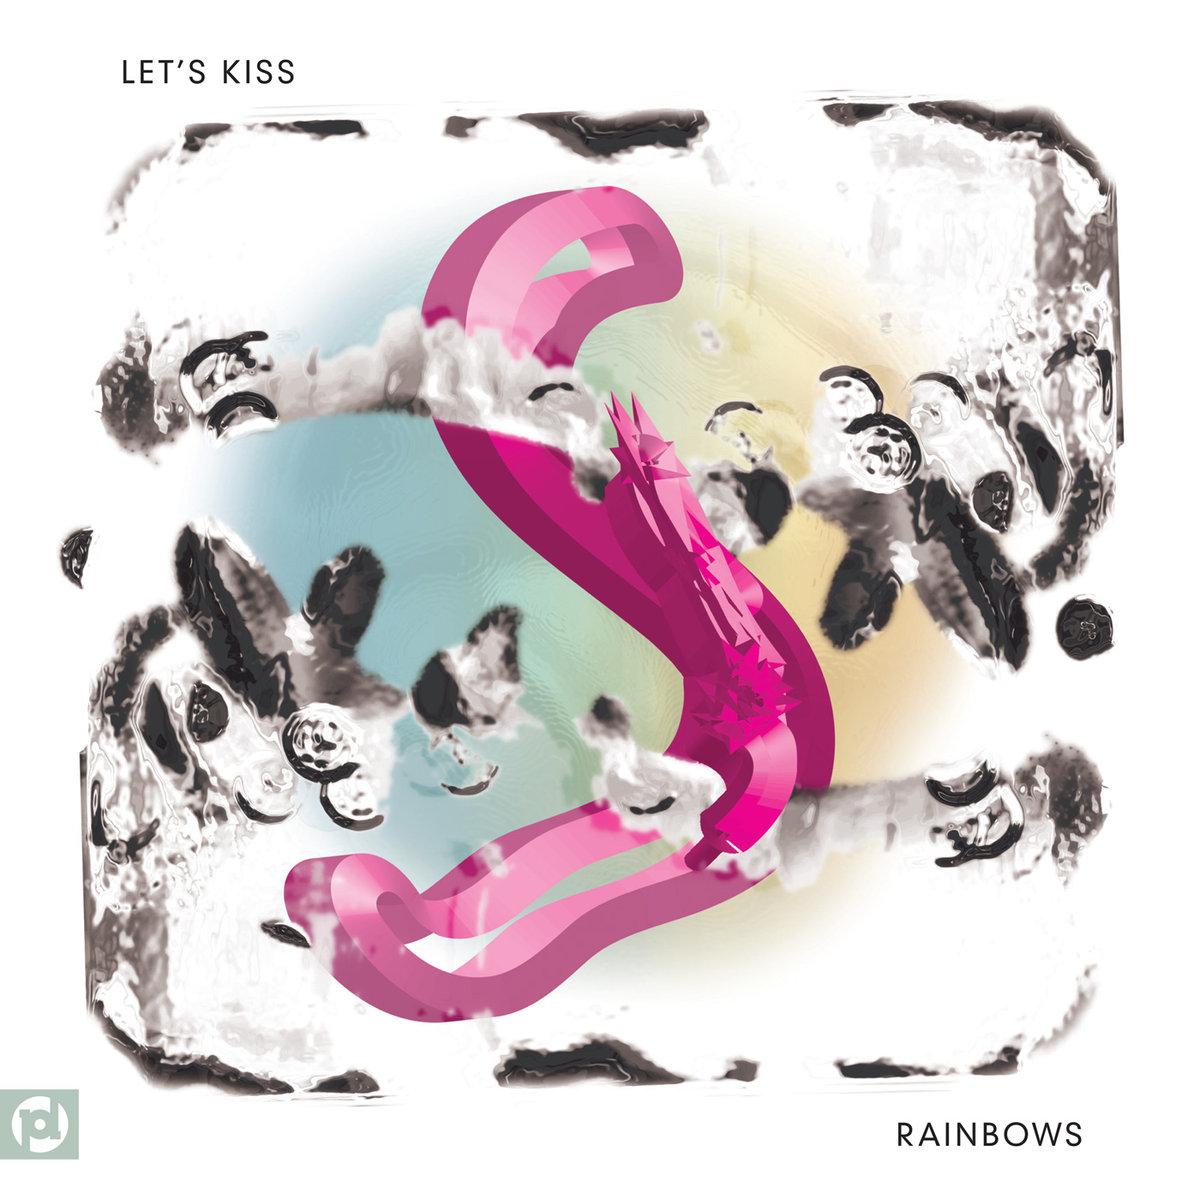 Rainbows - Let's Kiss (Party Damage Records)